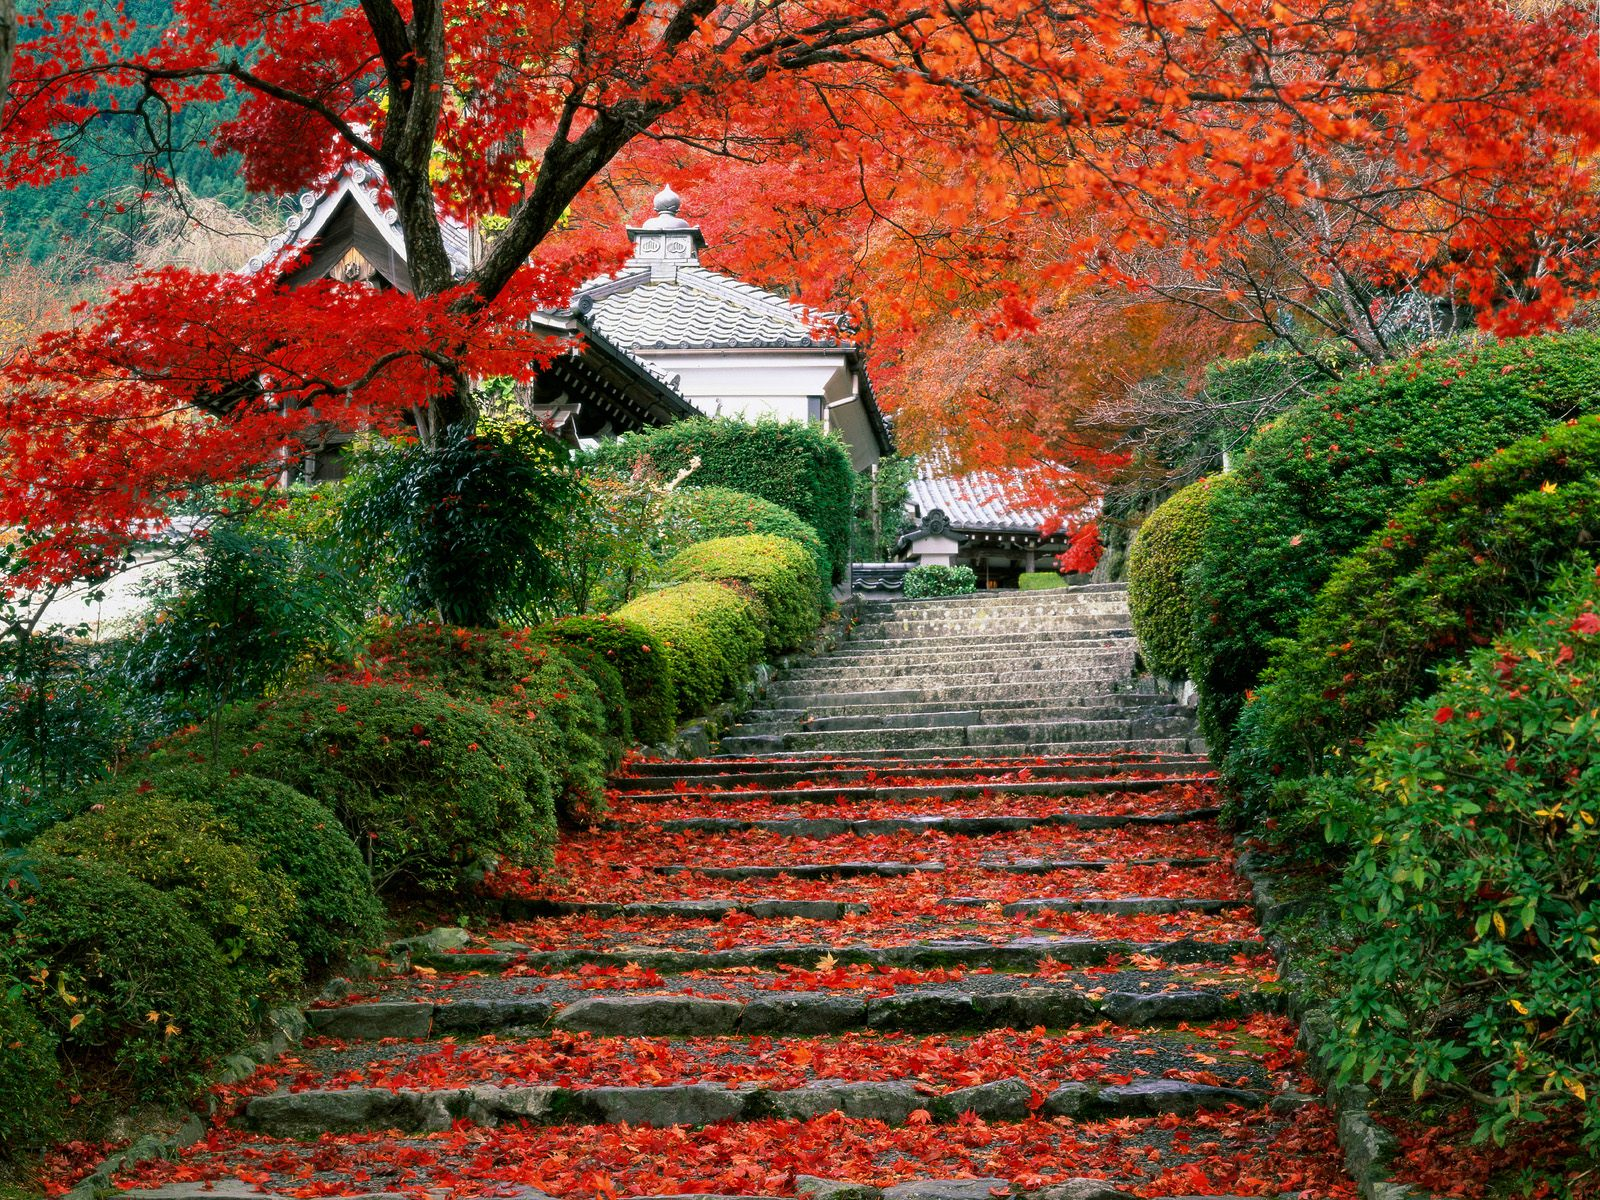 http://1.bp.blogspot.com/-k6ypL57pneQ/TgB-QBrtBuI/AAAAAAAAf98/28xkzCTkK44/s1600/garden-staircase-kyoto-japan.jpg